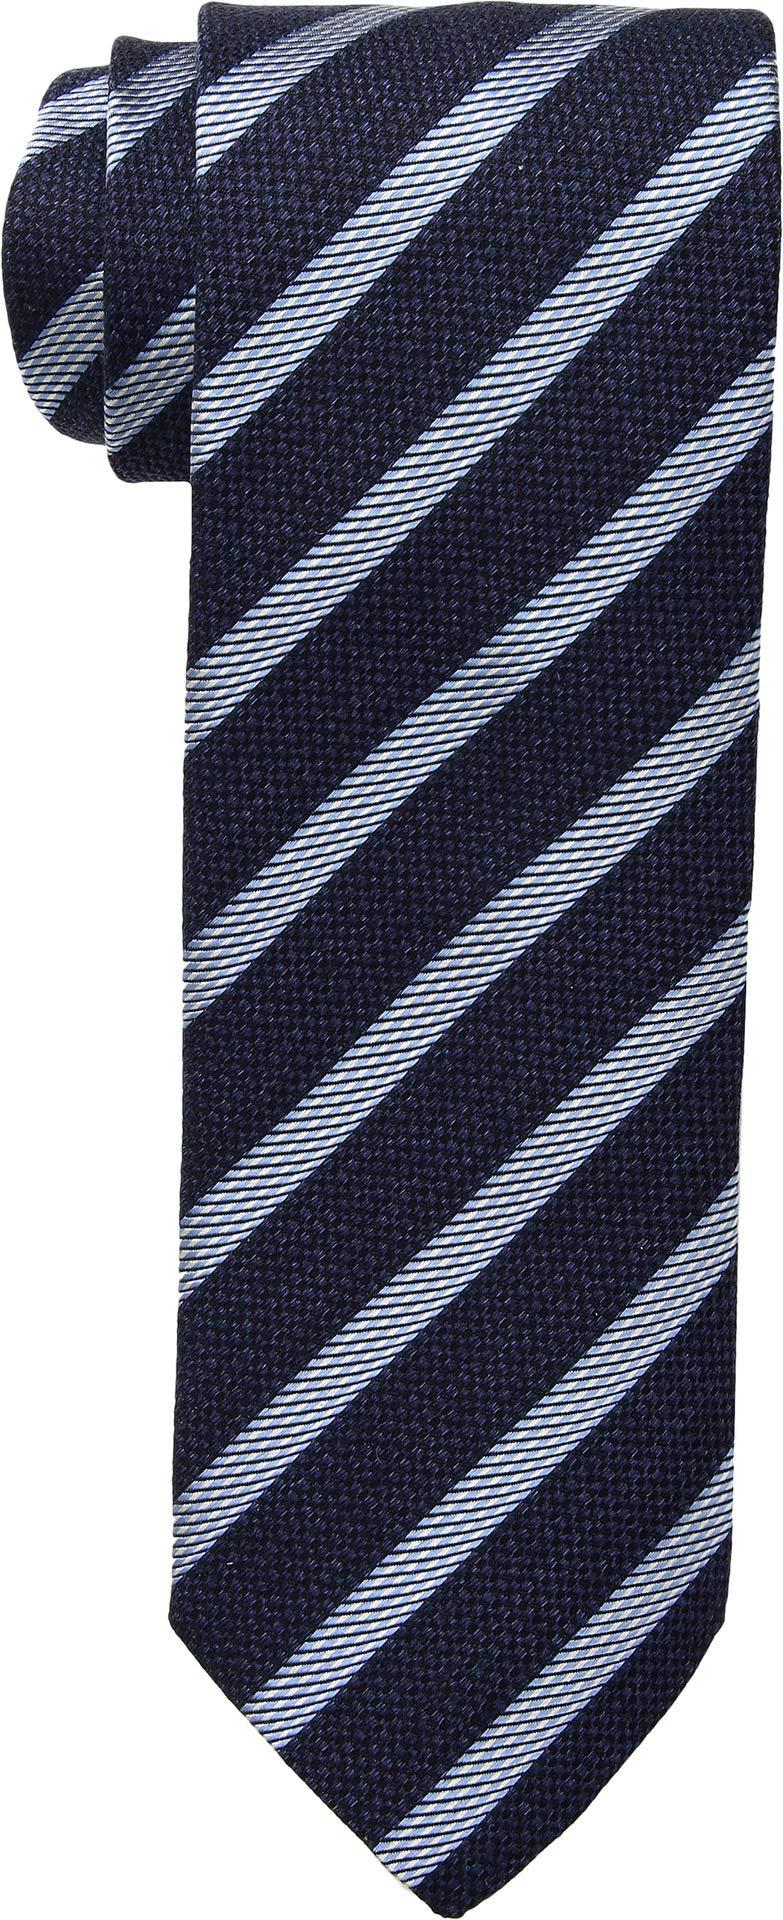 Eton Mens Stripe Tie Navy One Size